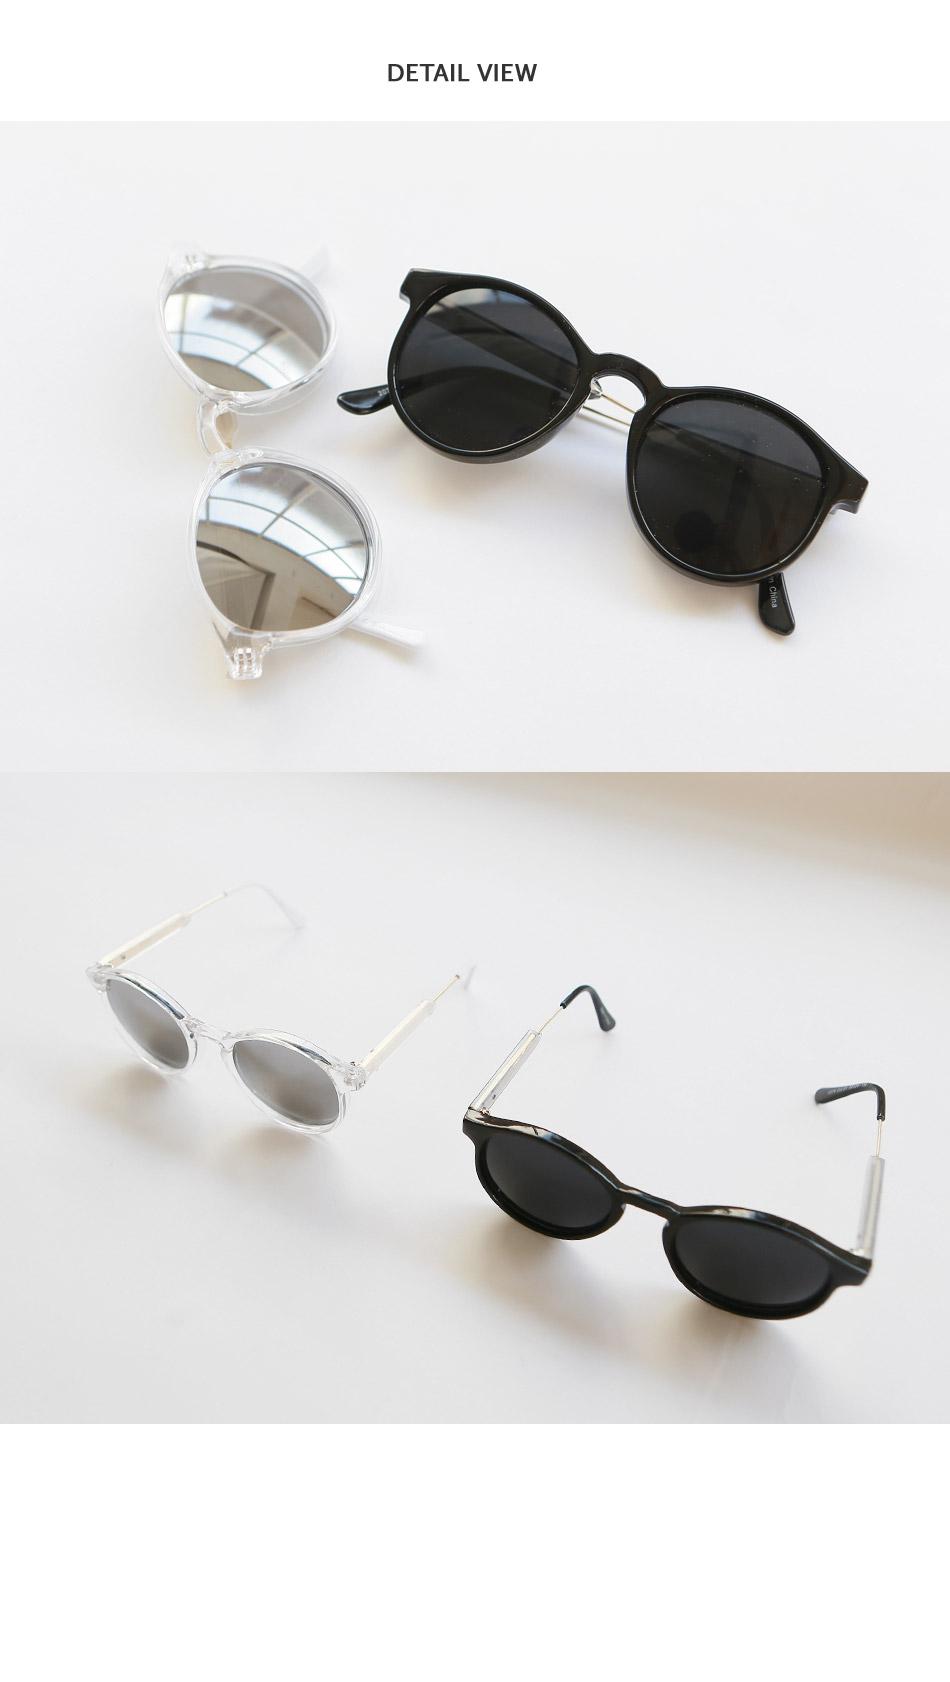 Wading sunglasses